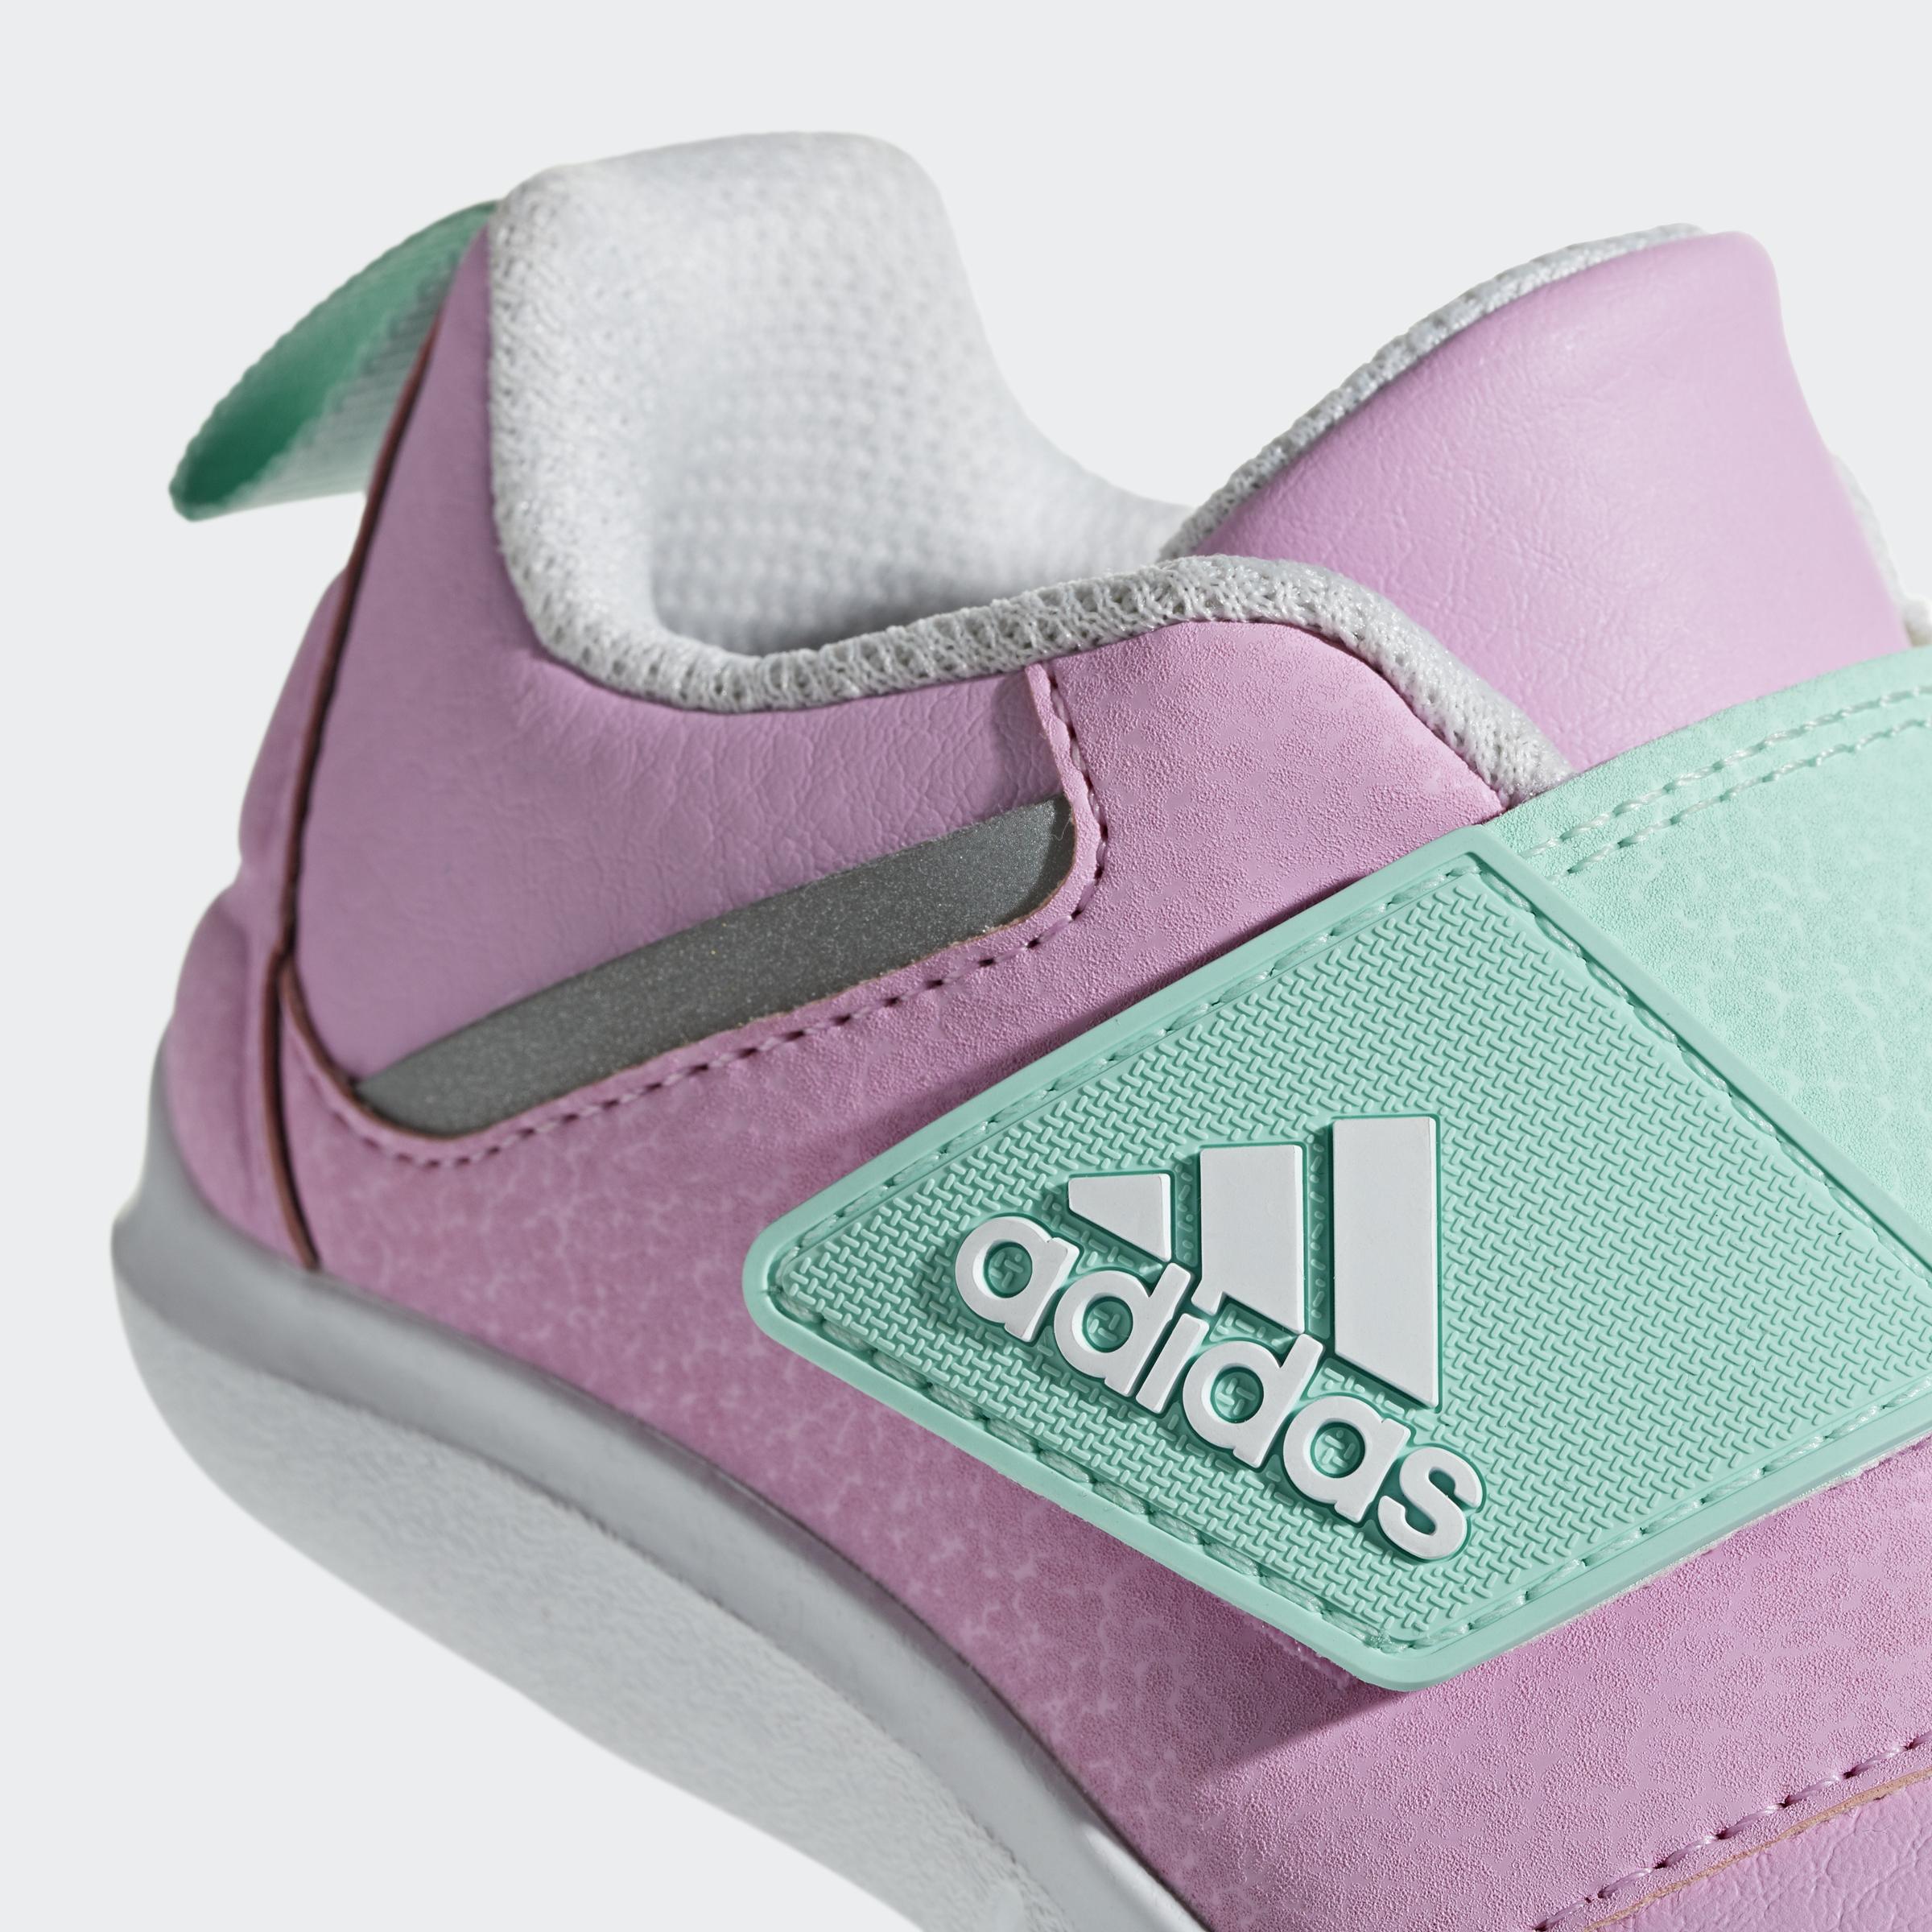 quality design 8c9da ab830 new styles 336f4 7b675 adidas fortaplay sko - anchorsawaybc.com